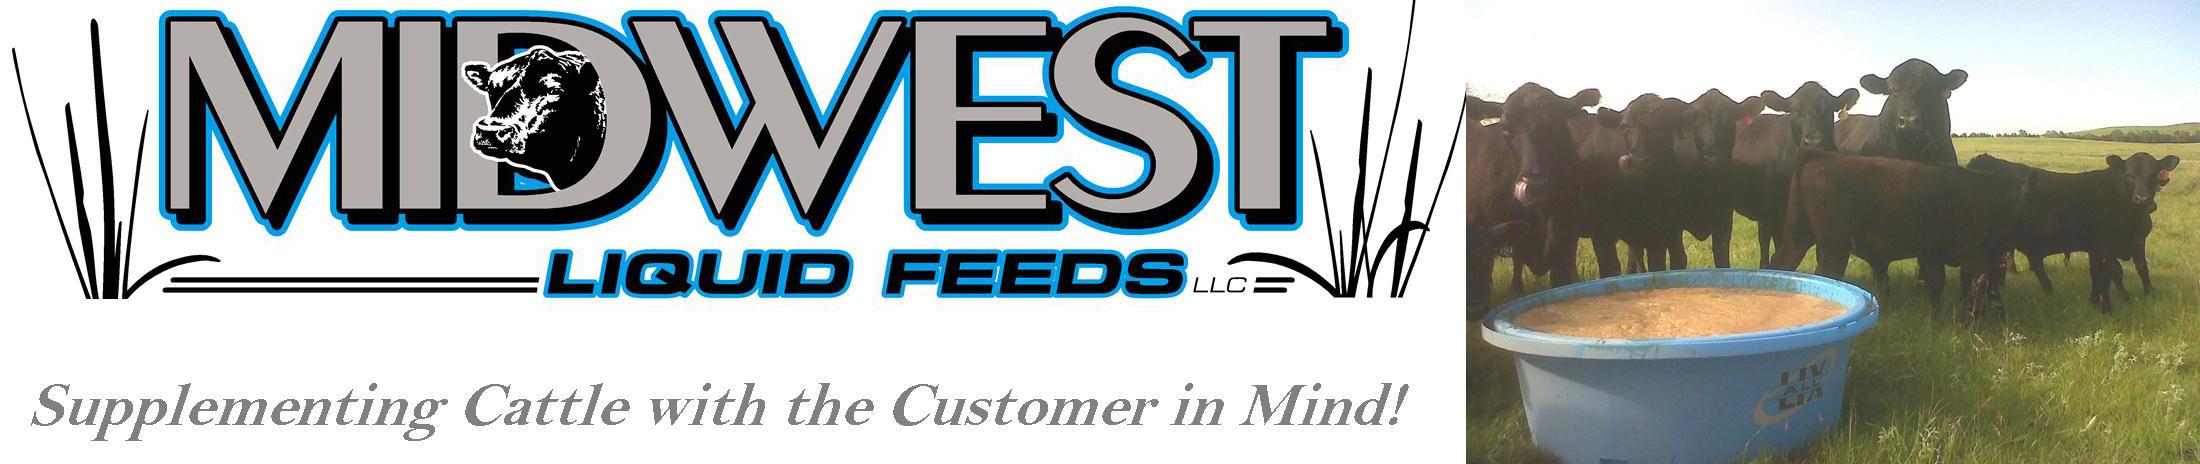 Liquid Cattle Feed Supplement, Midwest Liquid Feeds, LLC